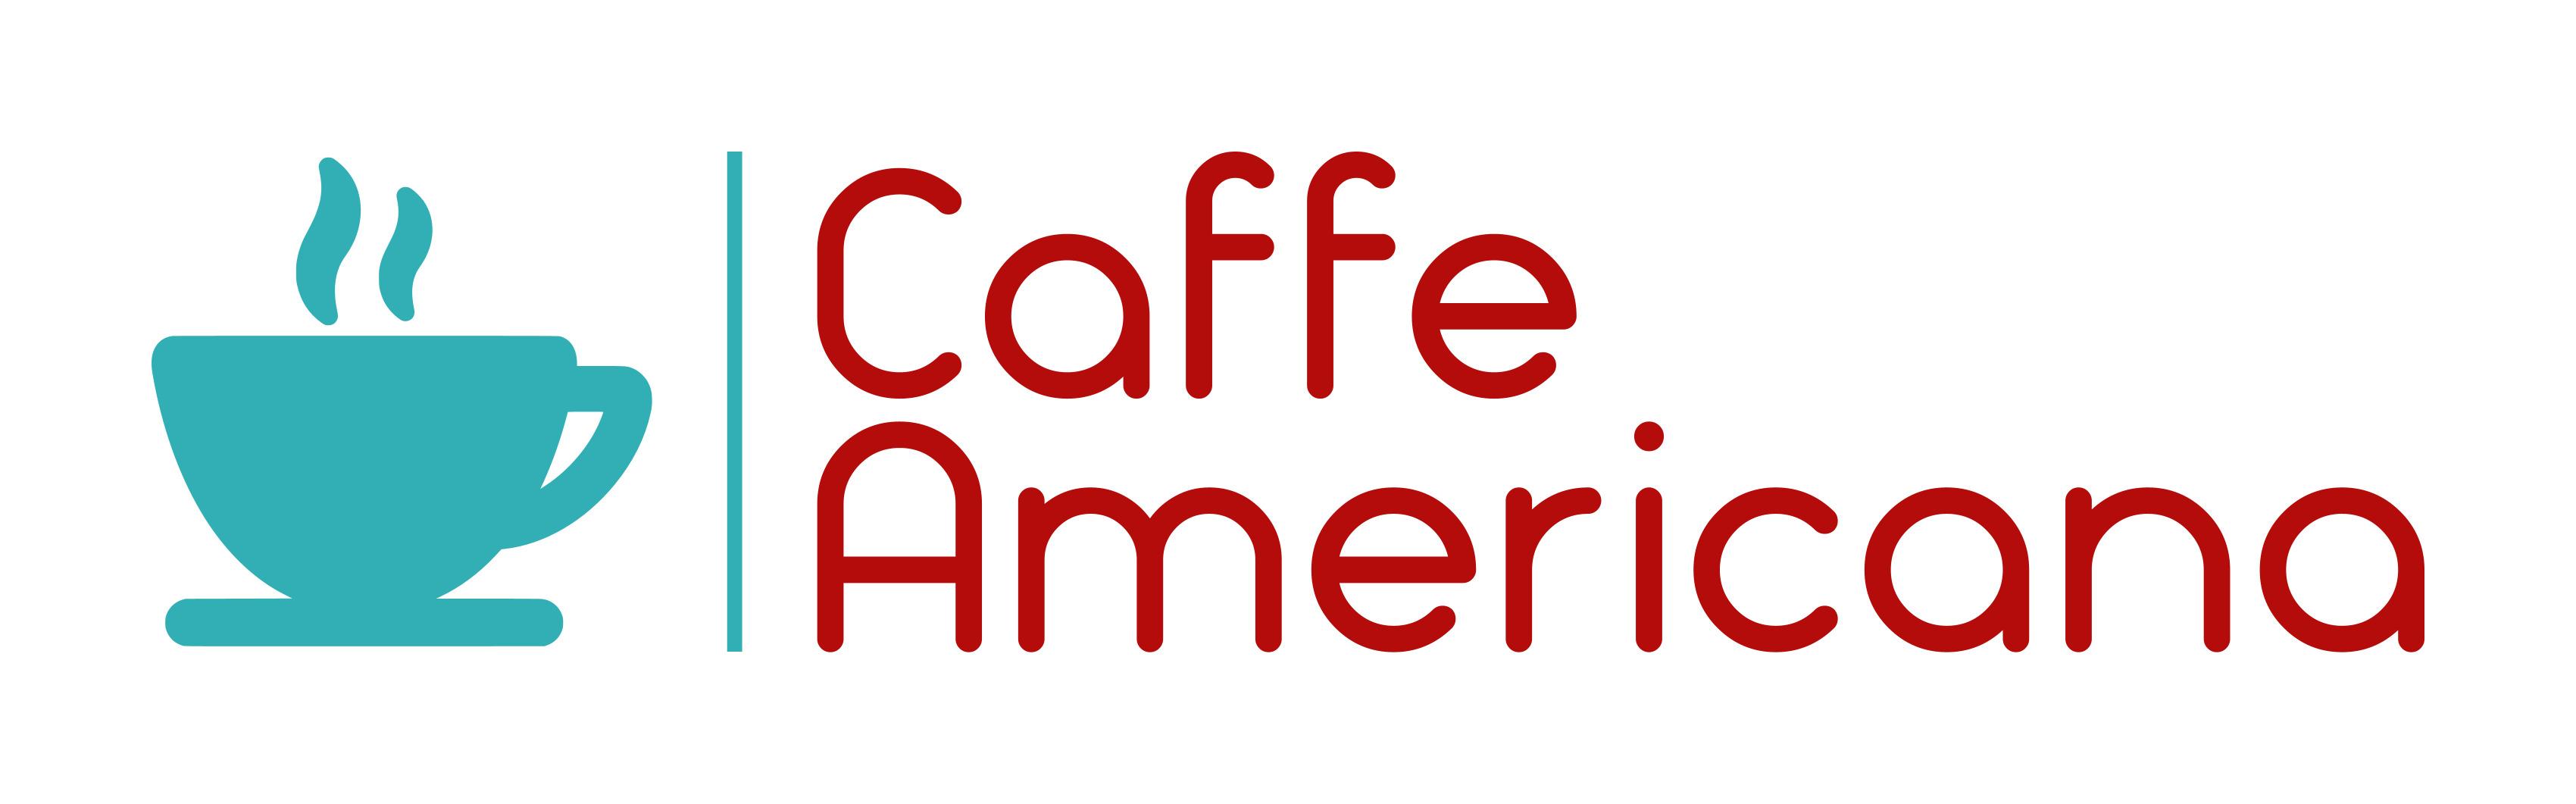 Caffe Americana